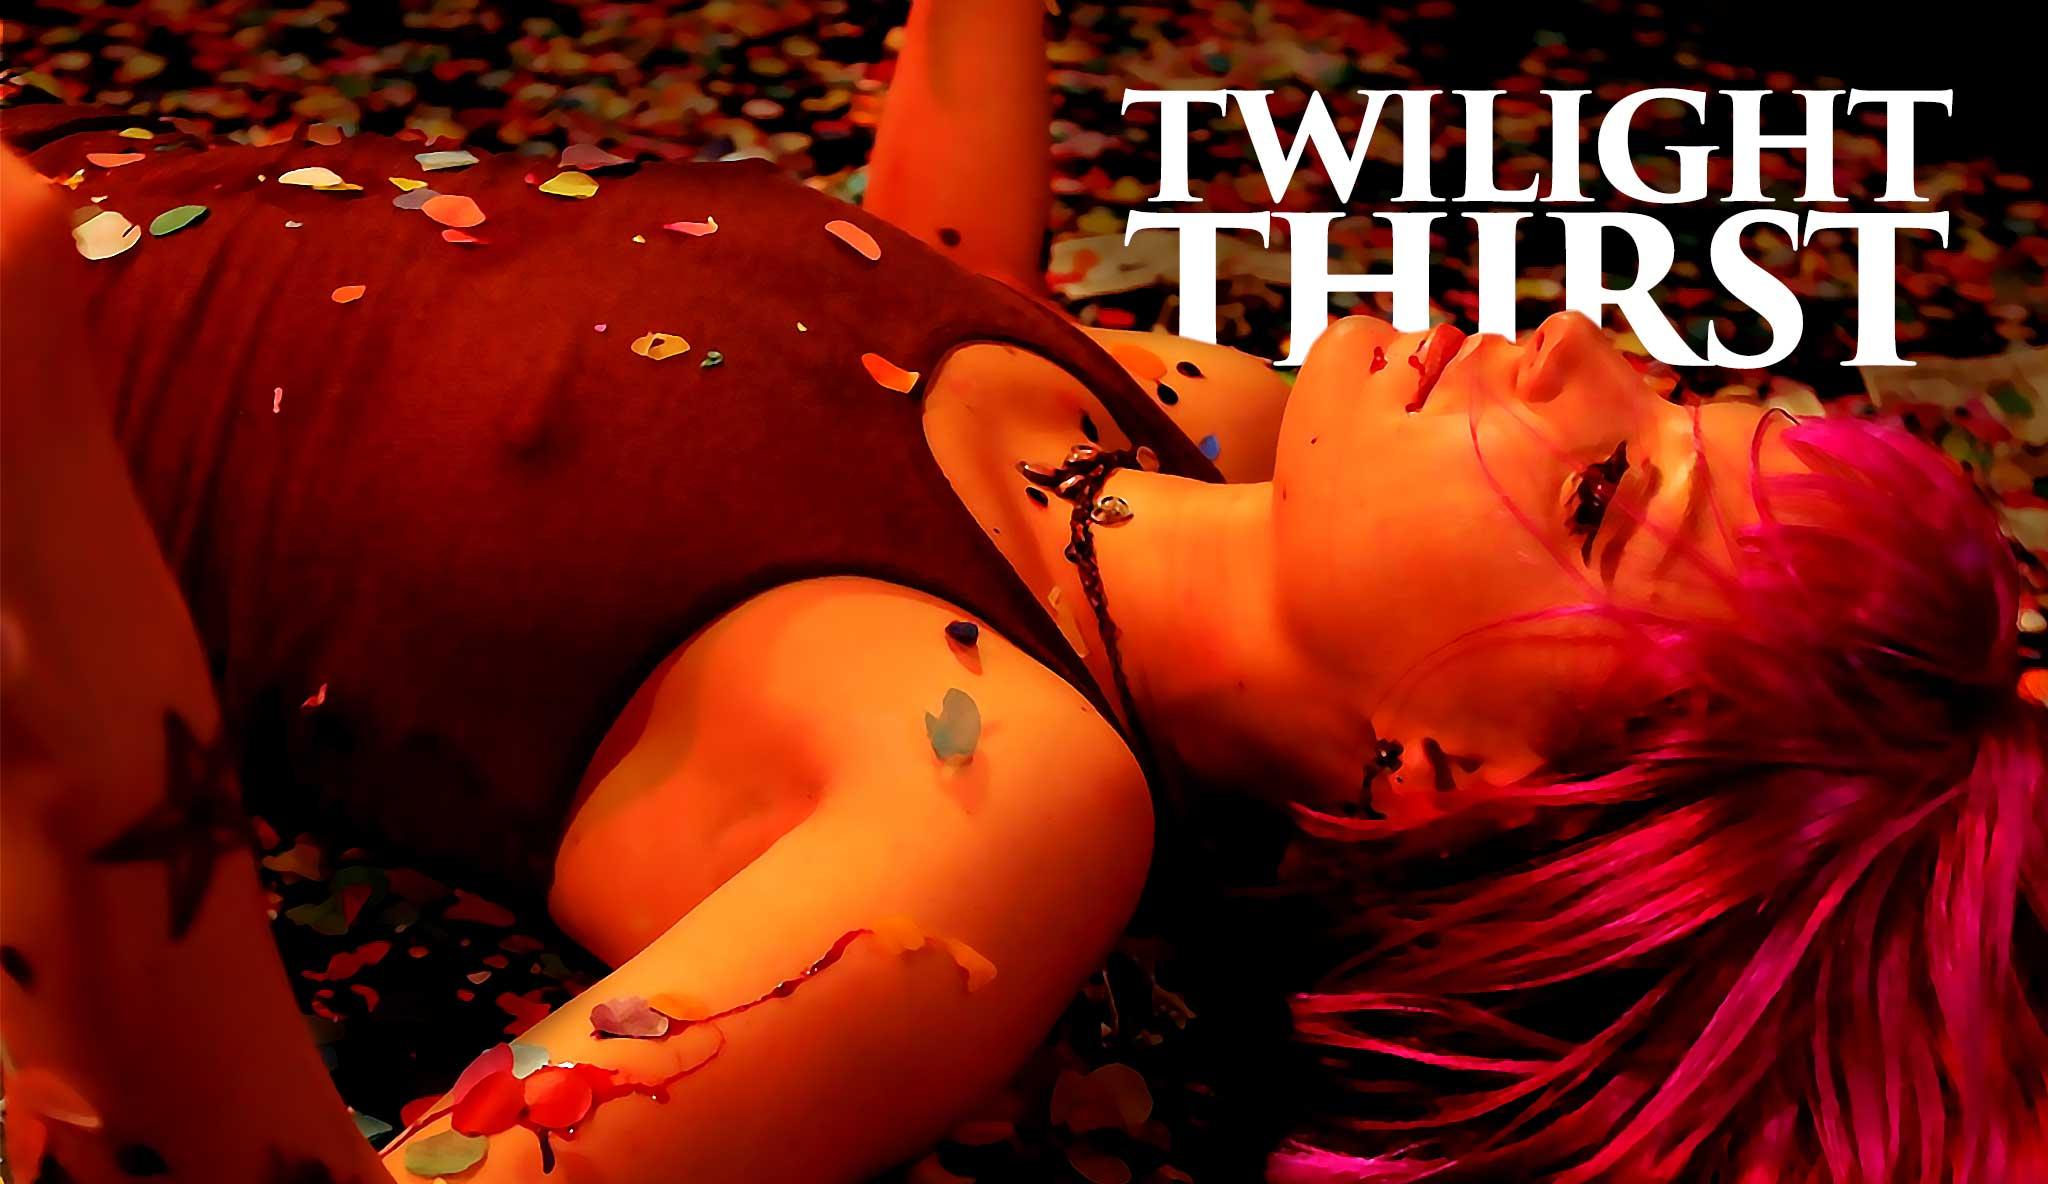 twilight-thirst\header.jpg